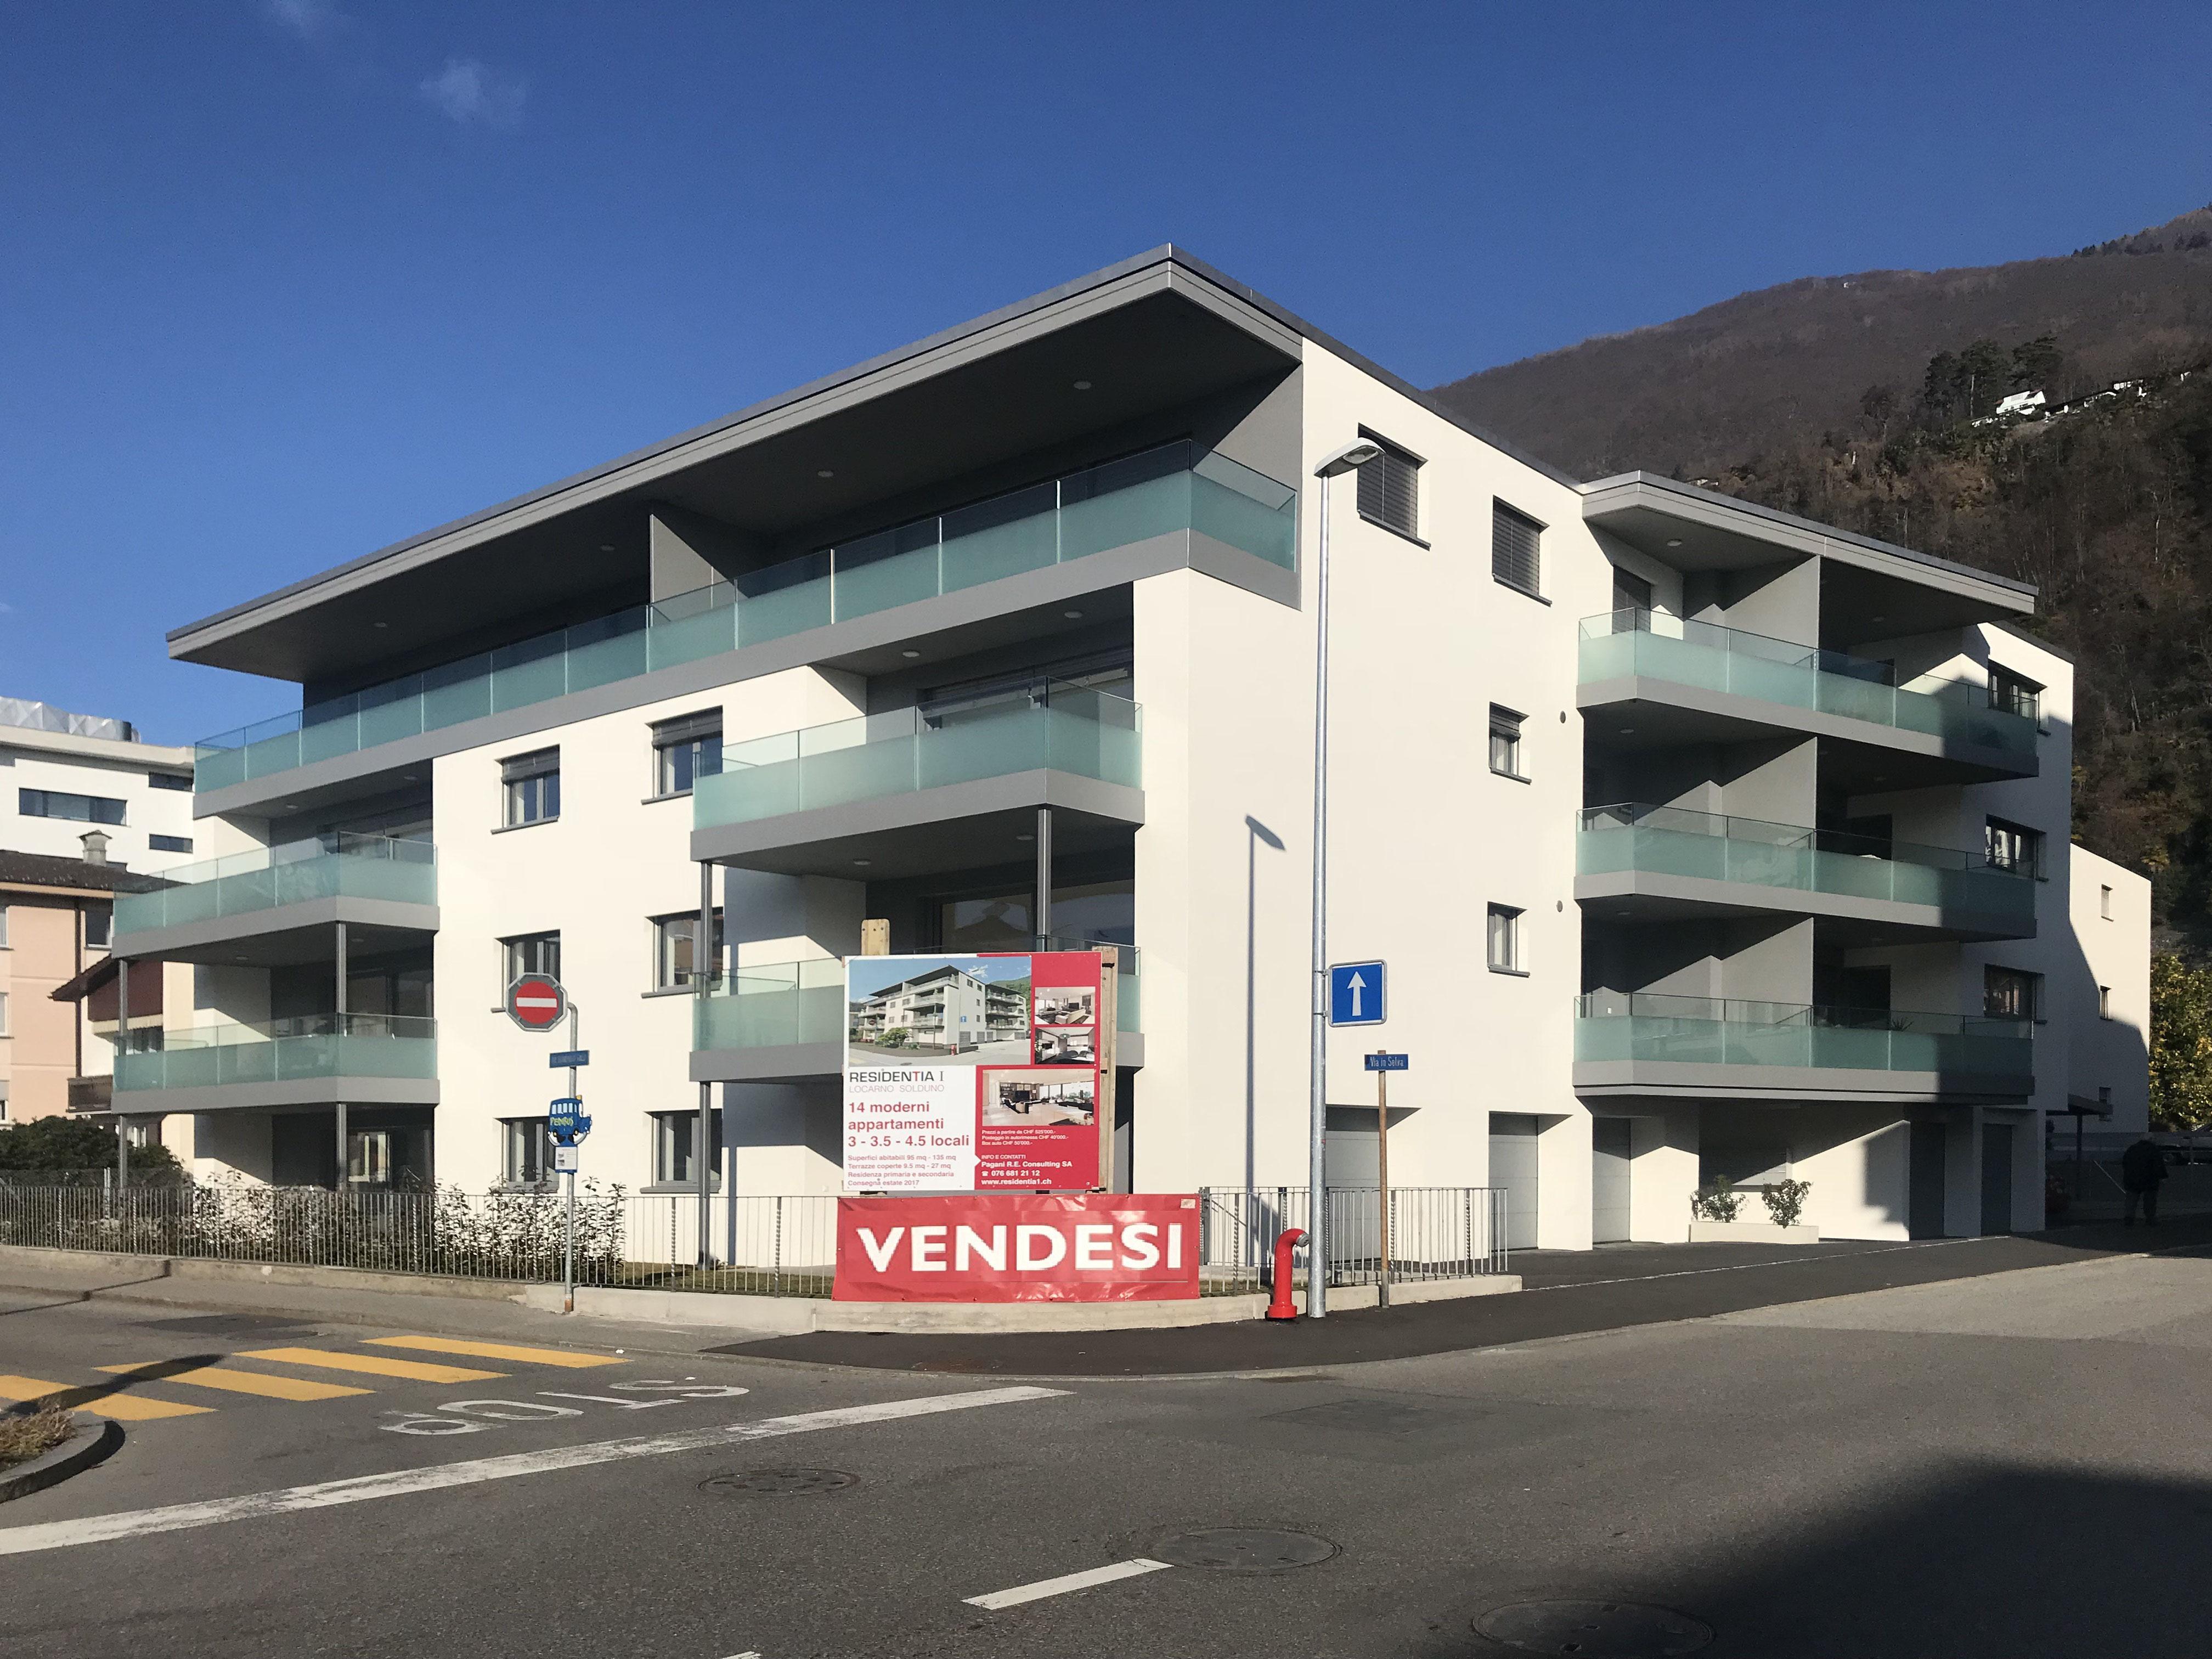 RESIDENTIA I - Locarno Solduno - Residentia I